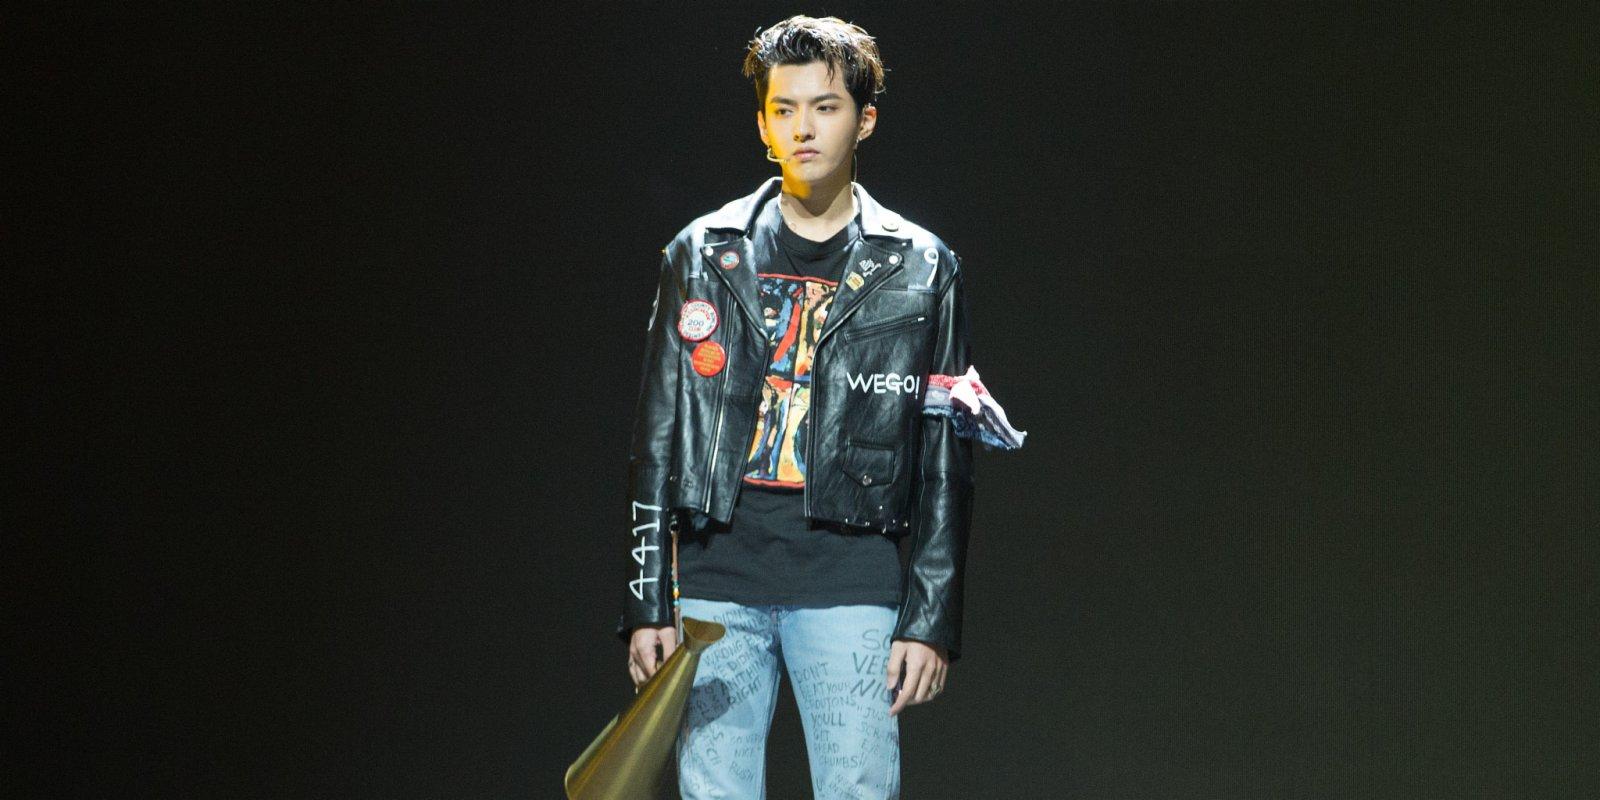 Chinese-Canadian pop idol Kris Wu arrested on suspicion of rape